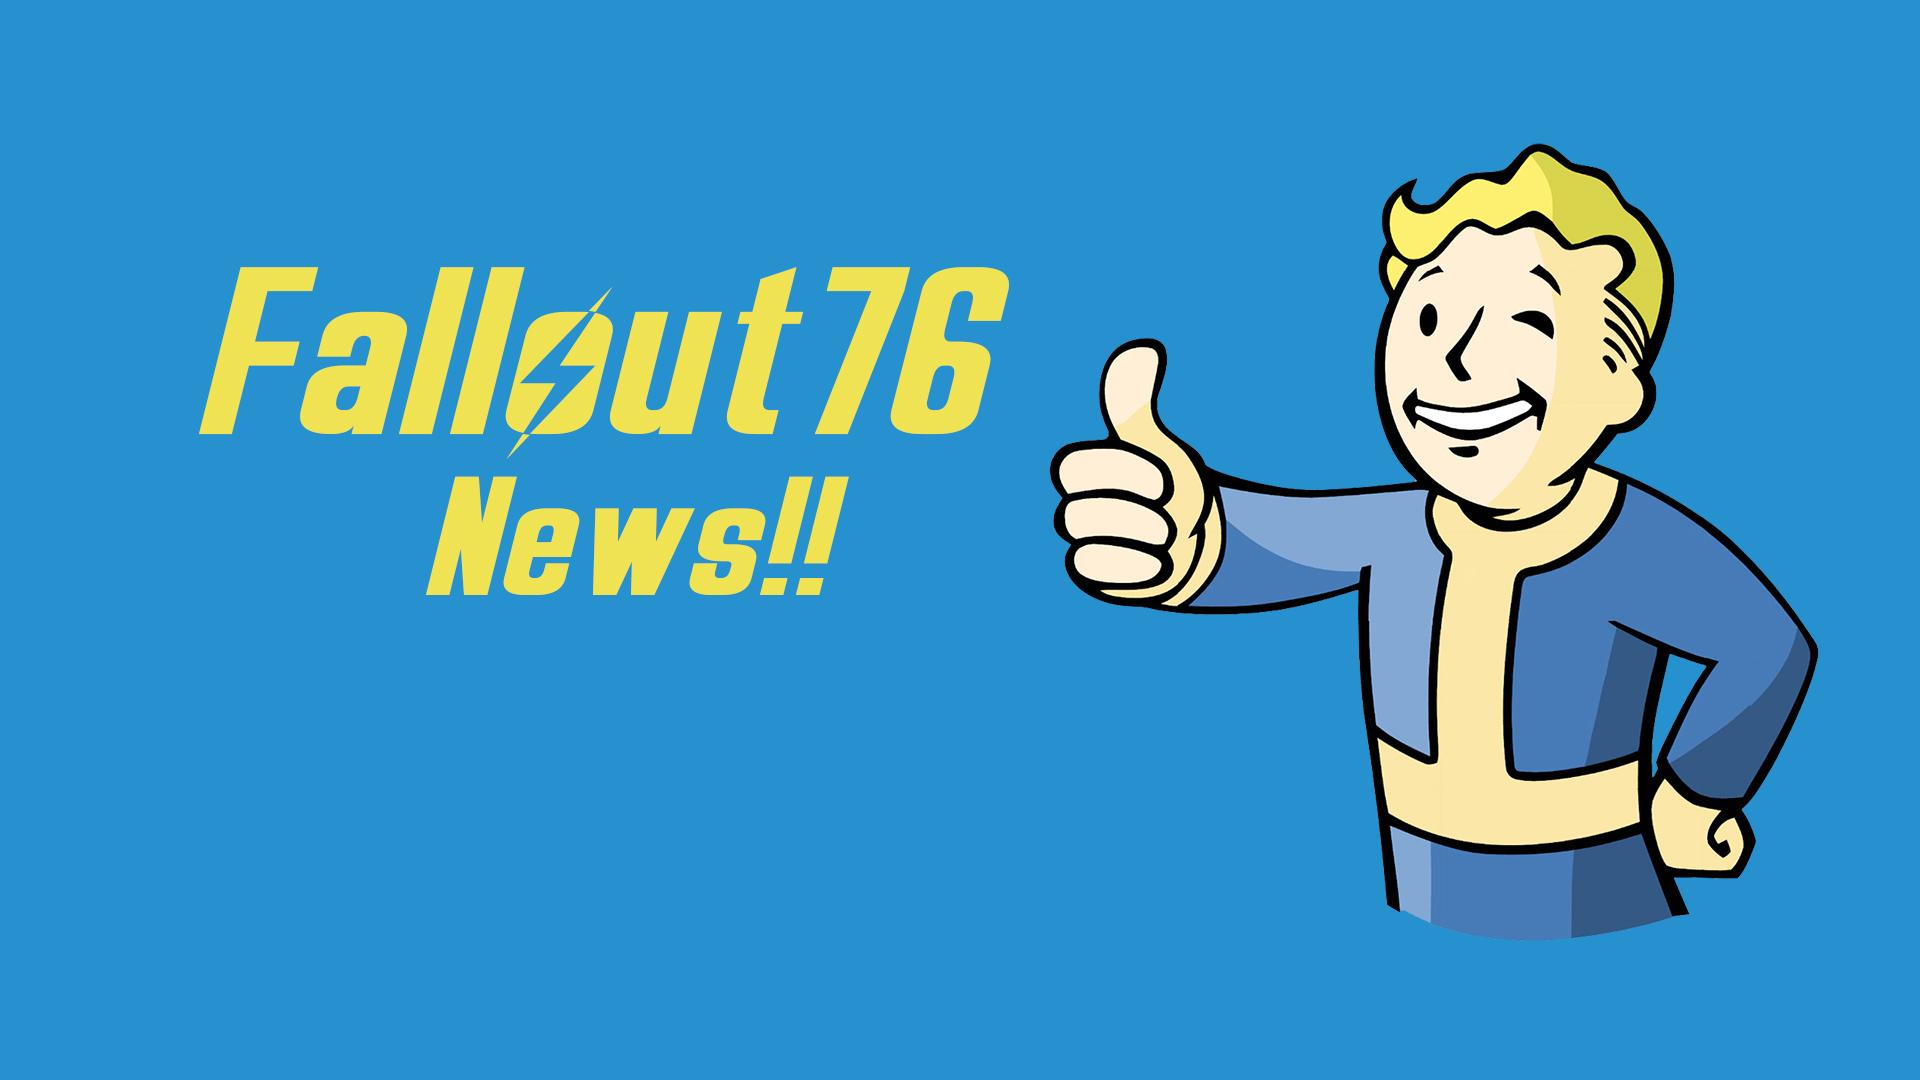 《PS4版 Fallout76 B.E.T.A》クラフトの処理落ちを回避する方法